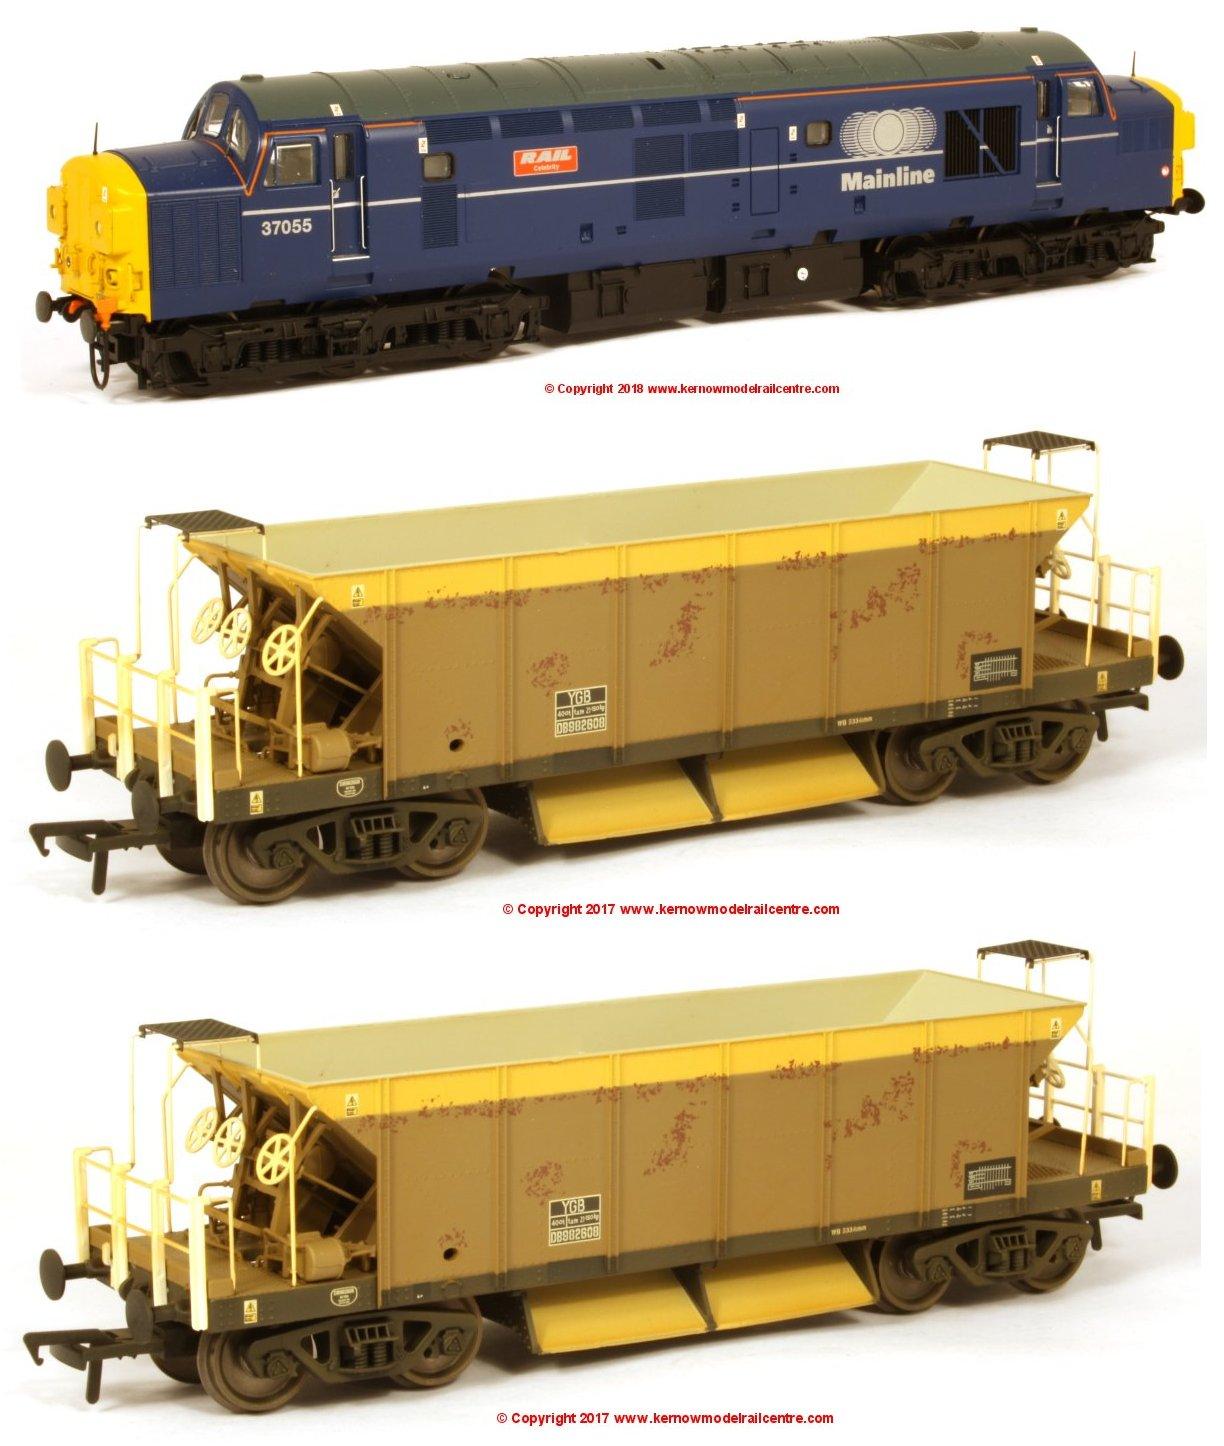 K9972 Mainline Freight Ballast Pack image